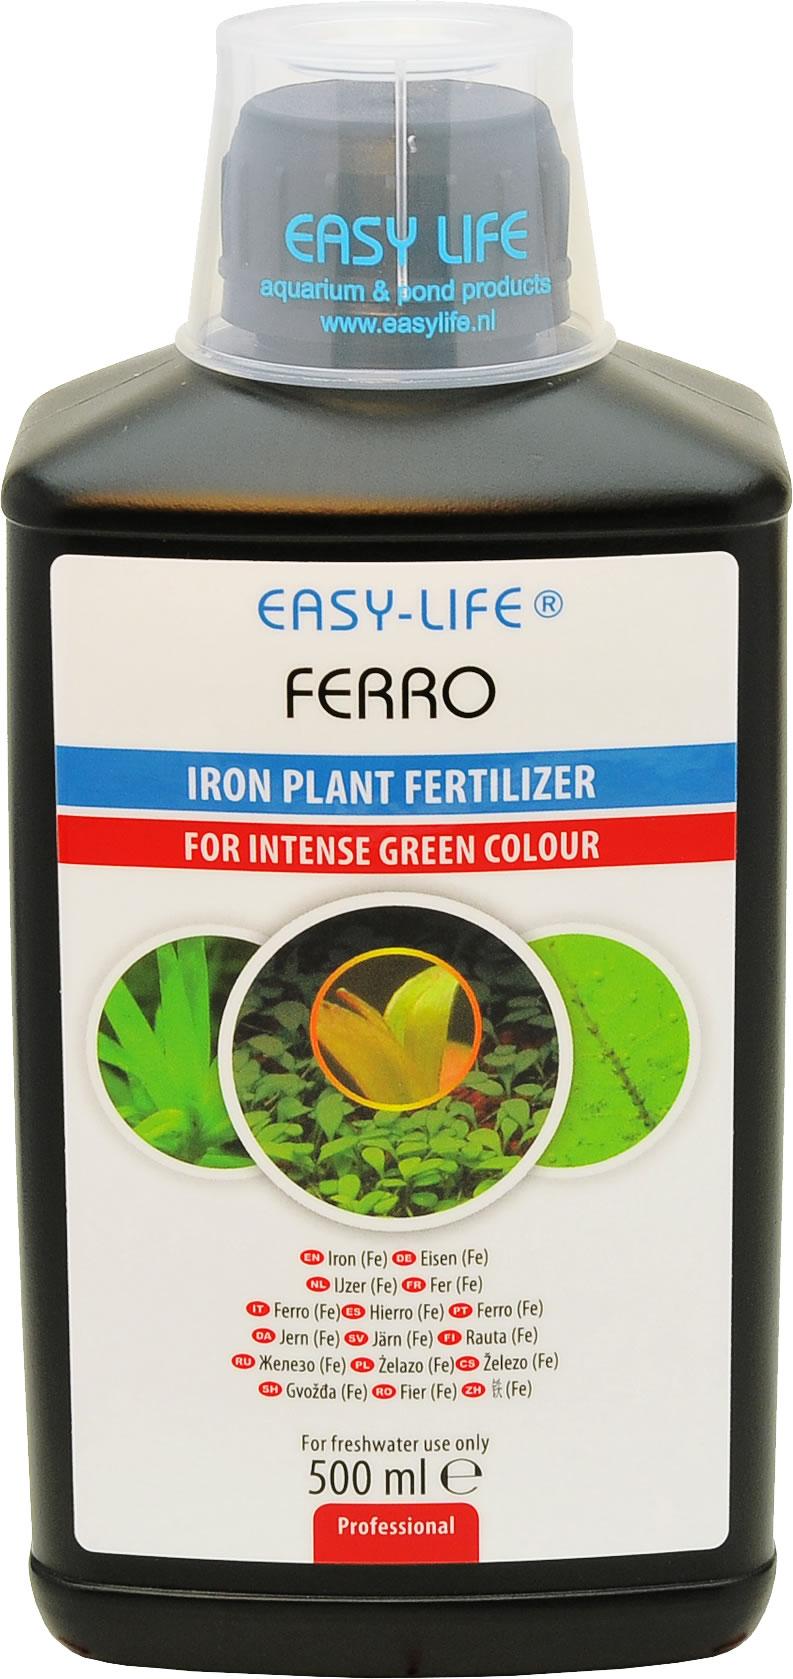 Easy Life Ferro 500 ml jetztbilligerkaufen